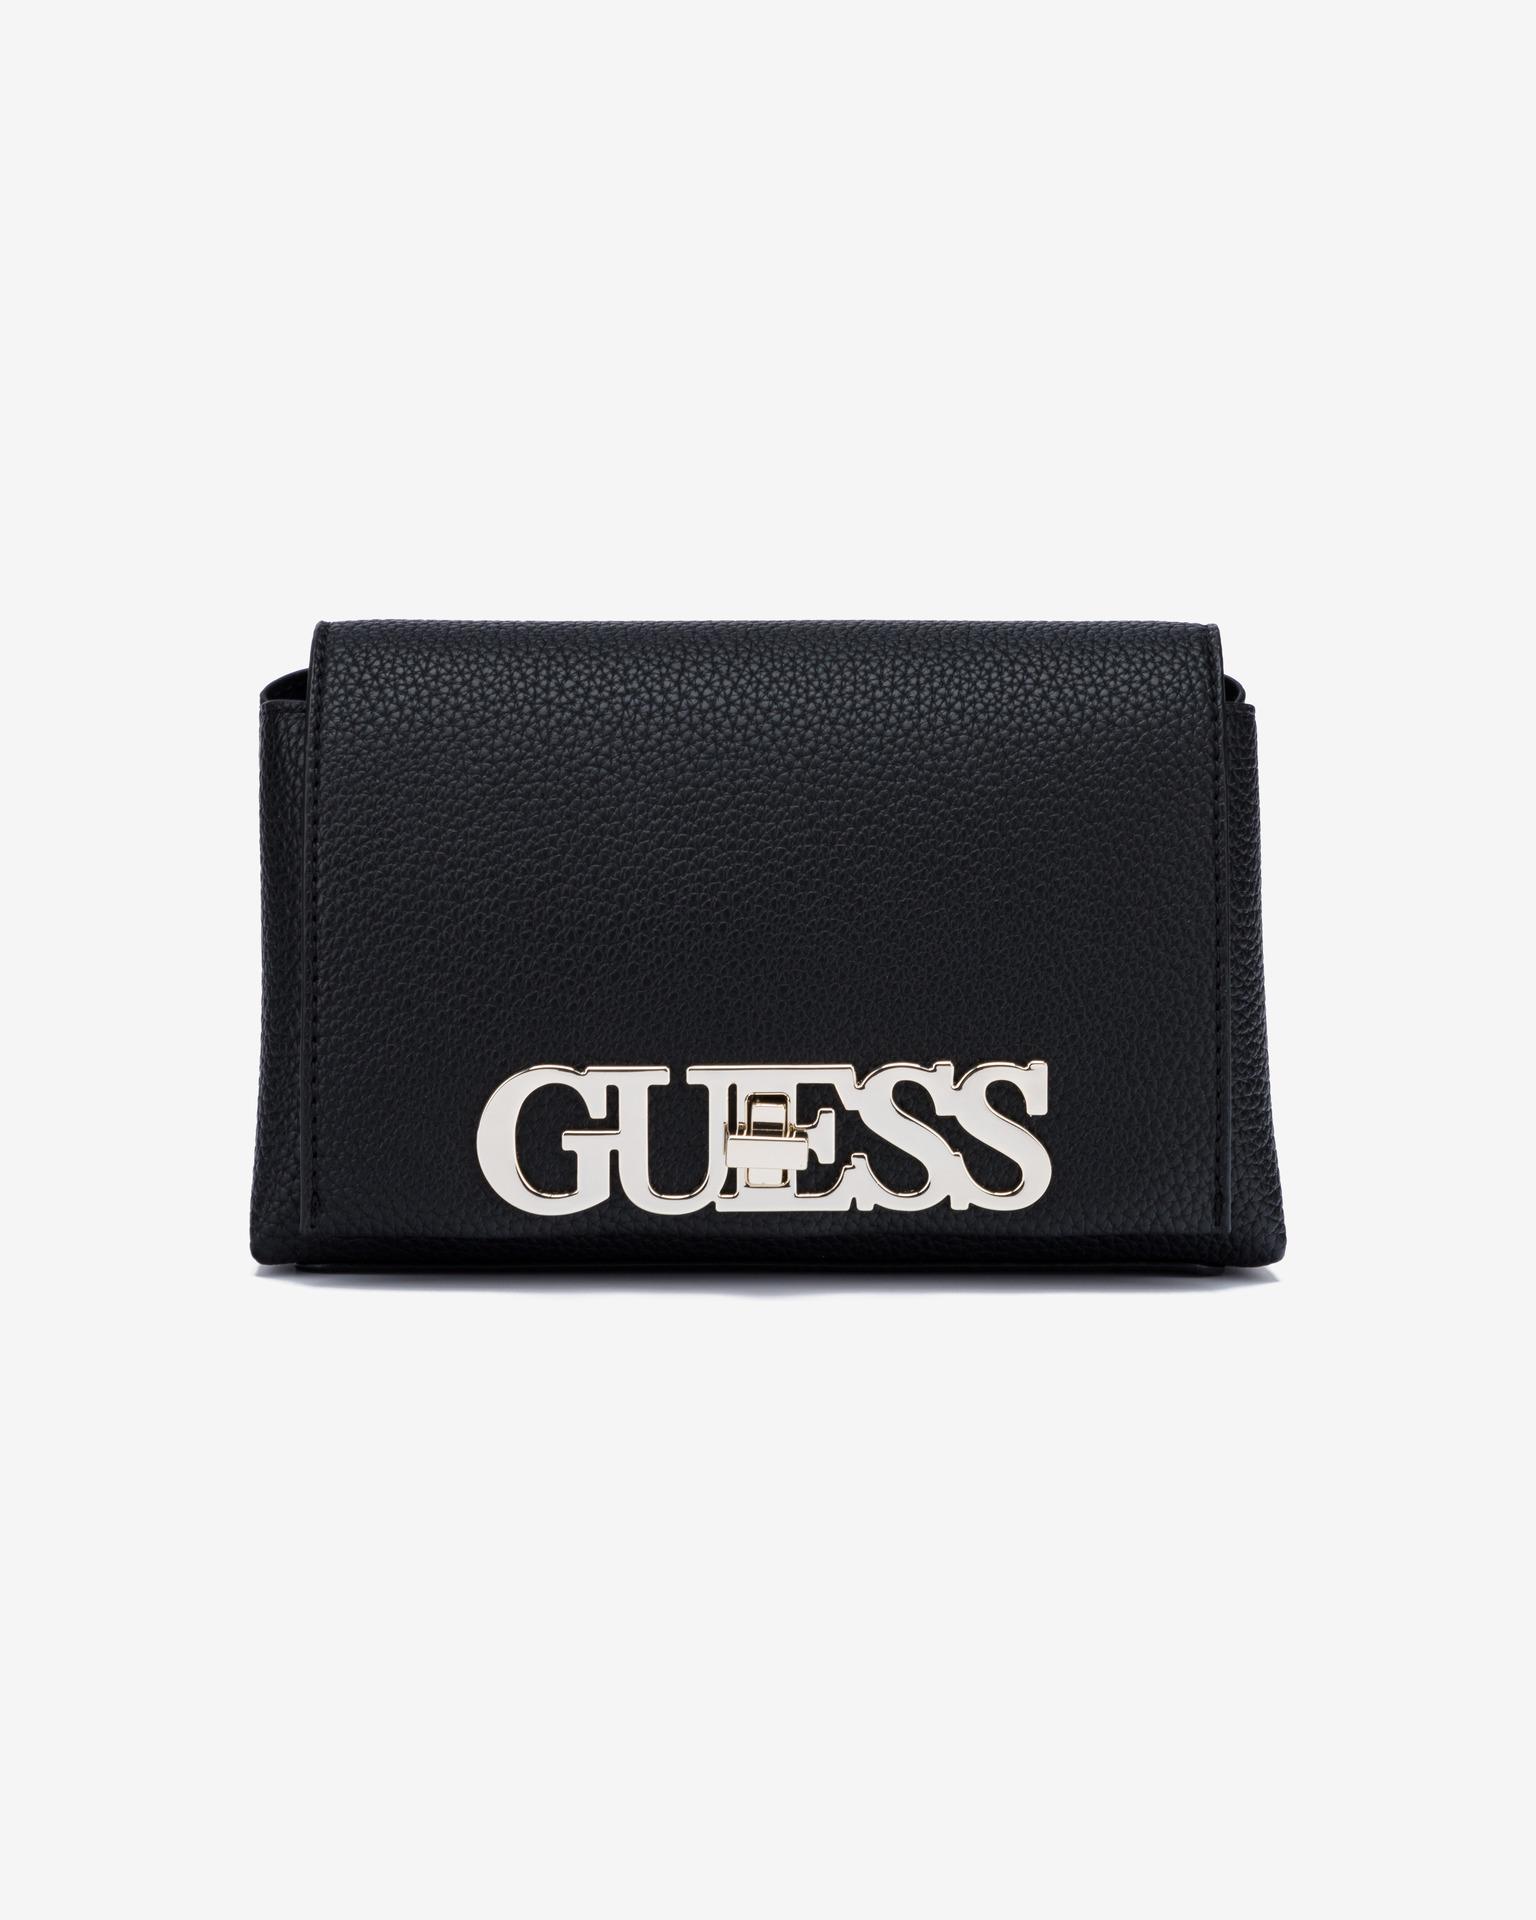 Guess black crossbody handbag Uptown Chic Mini